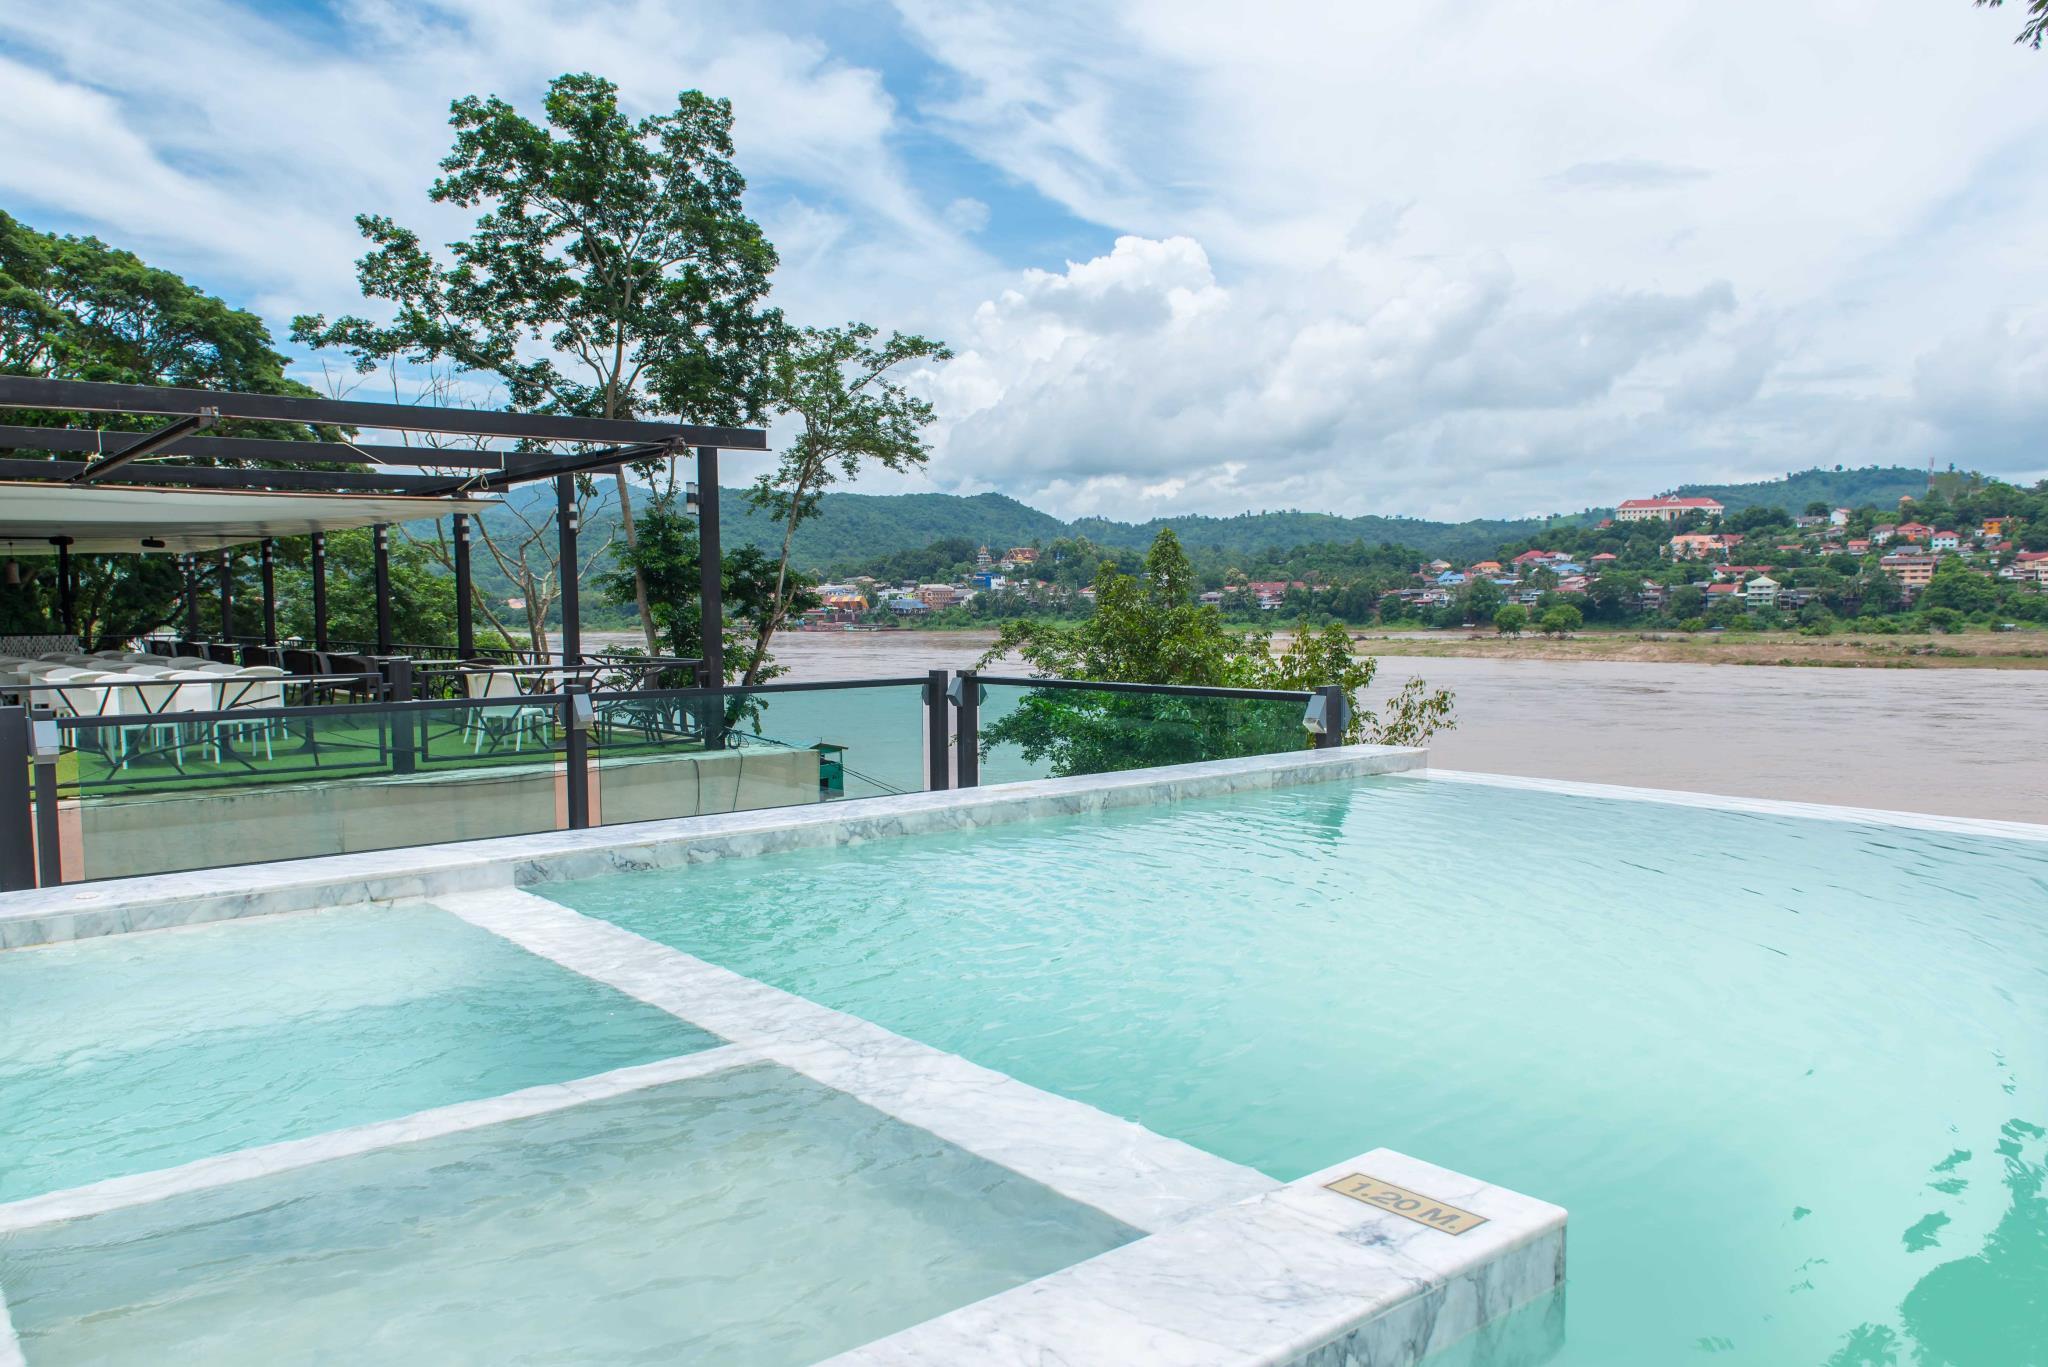 Chiangkhong Teak Garden Riverfront Hotel